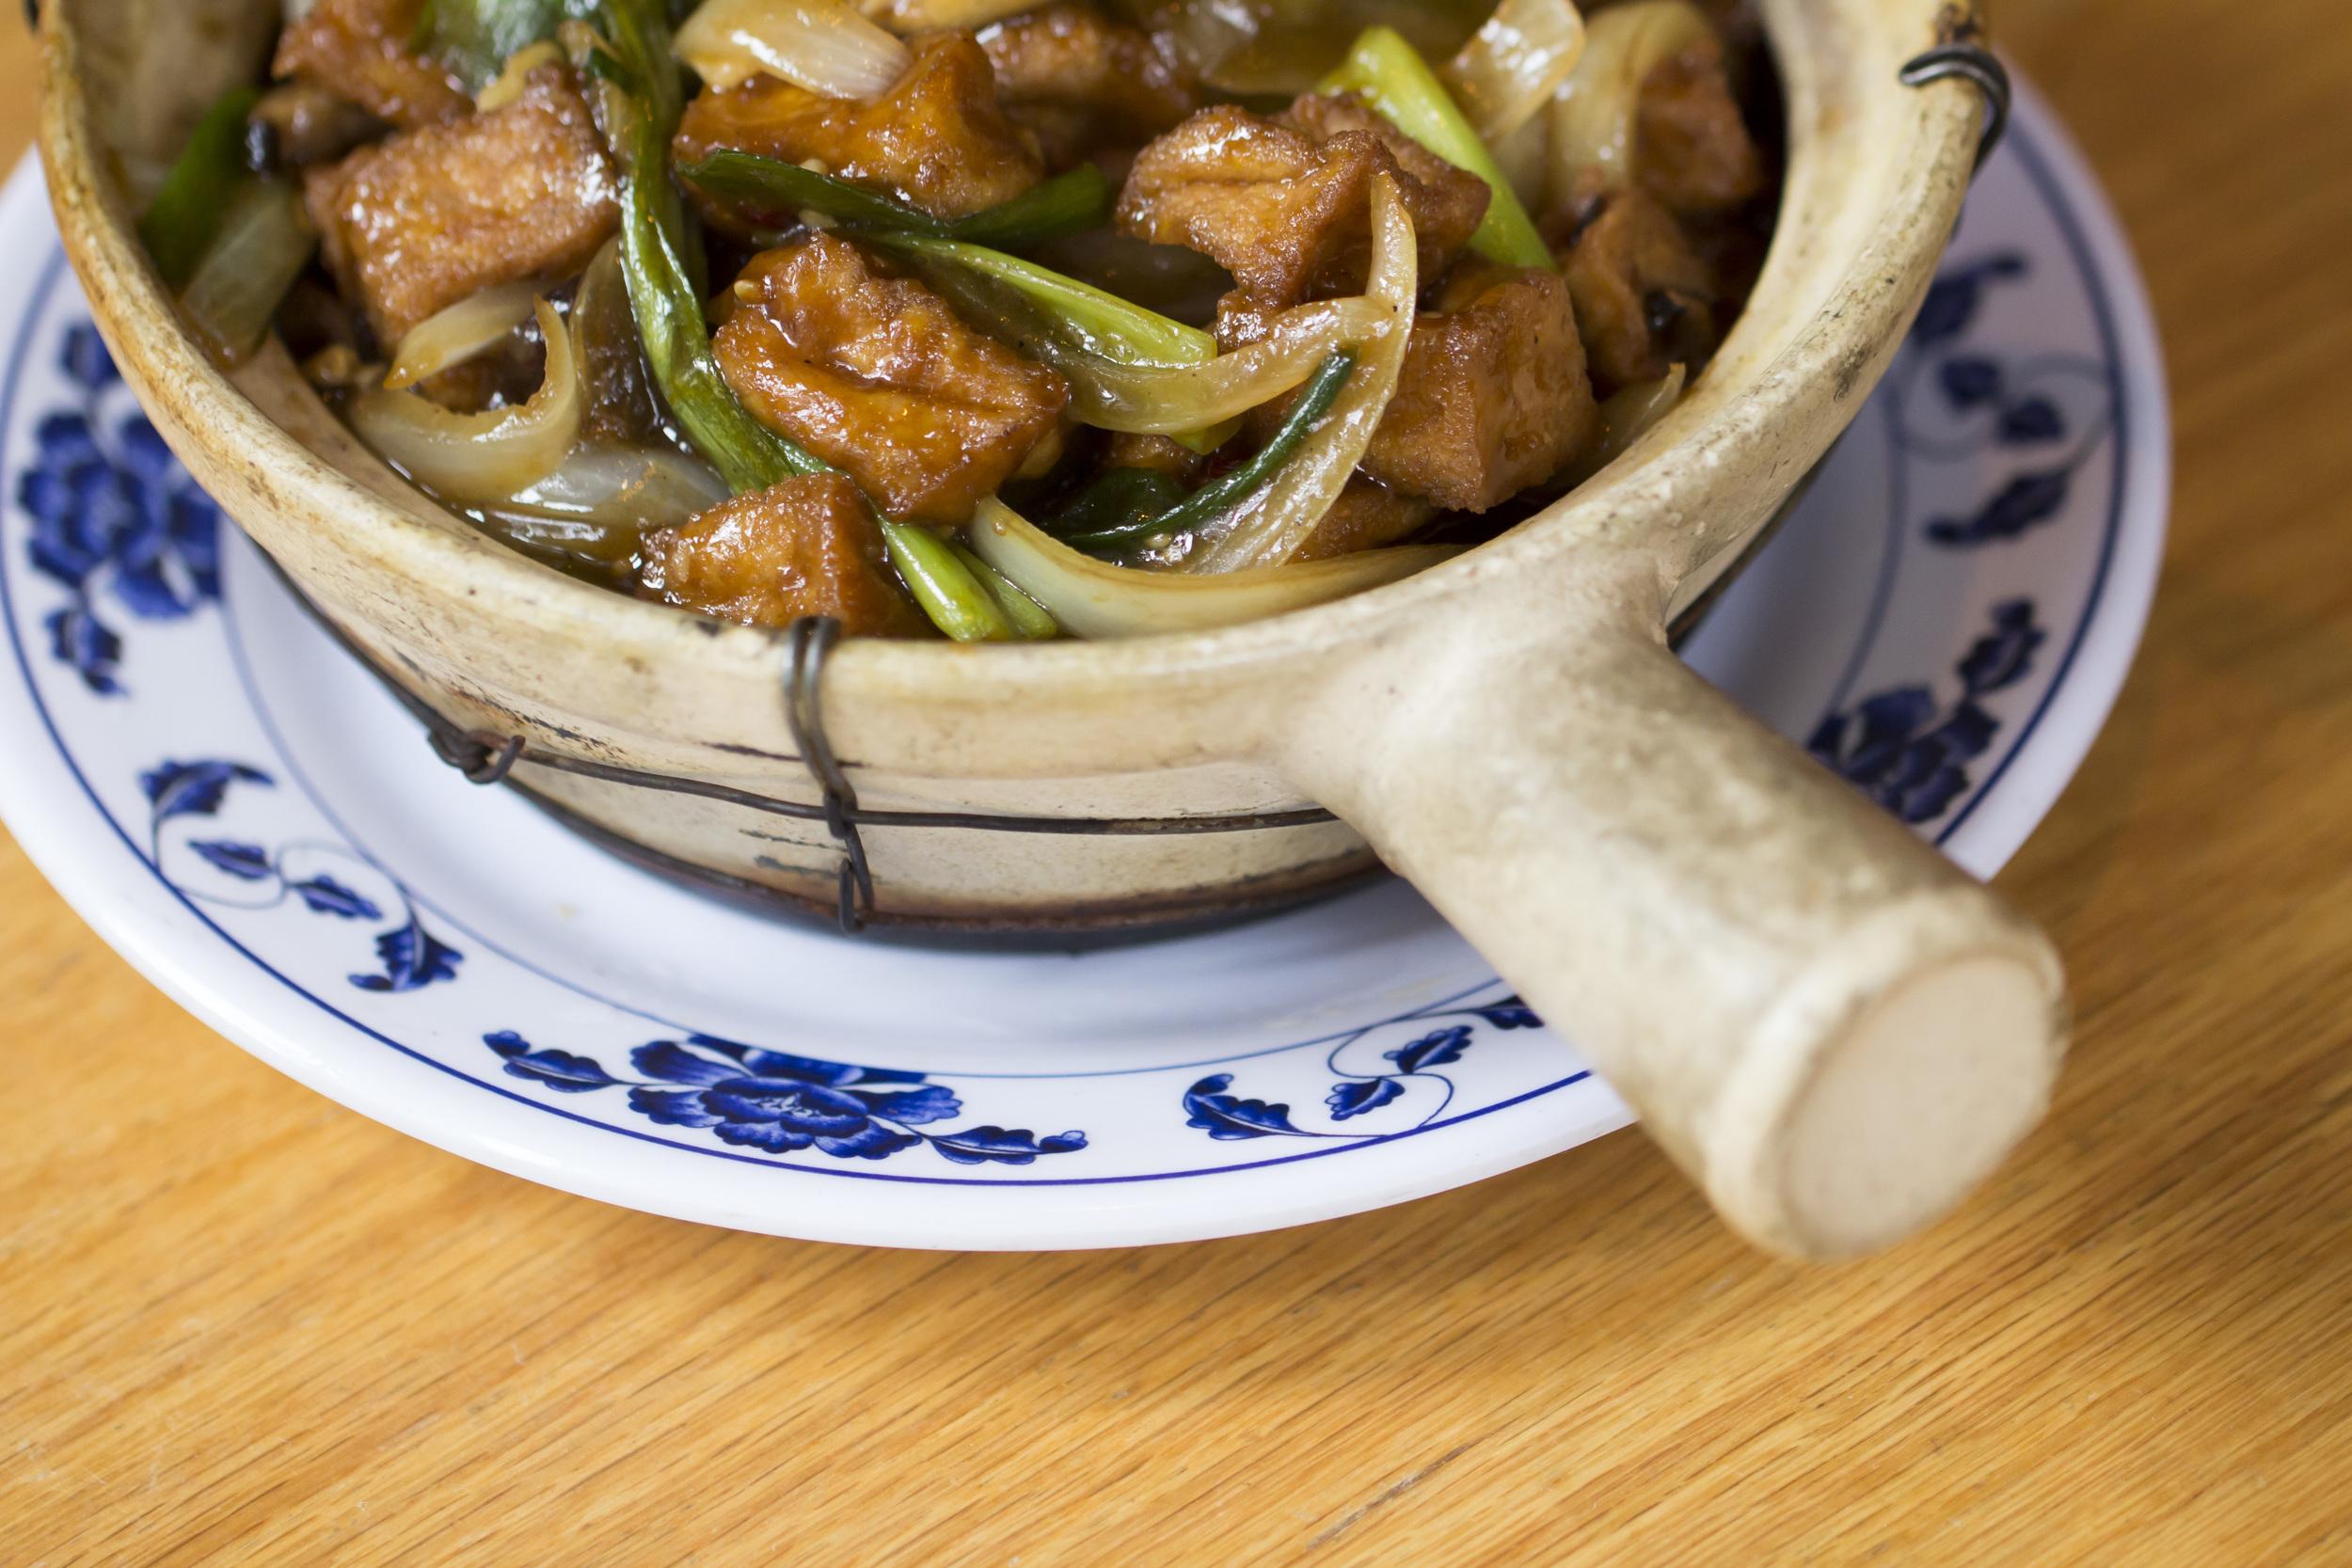 9-15-15 Modern China Photos Food and Bev_12.JPG